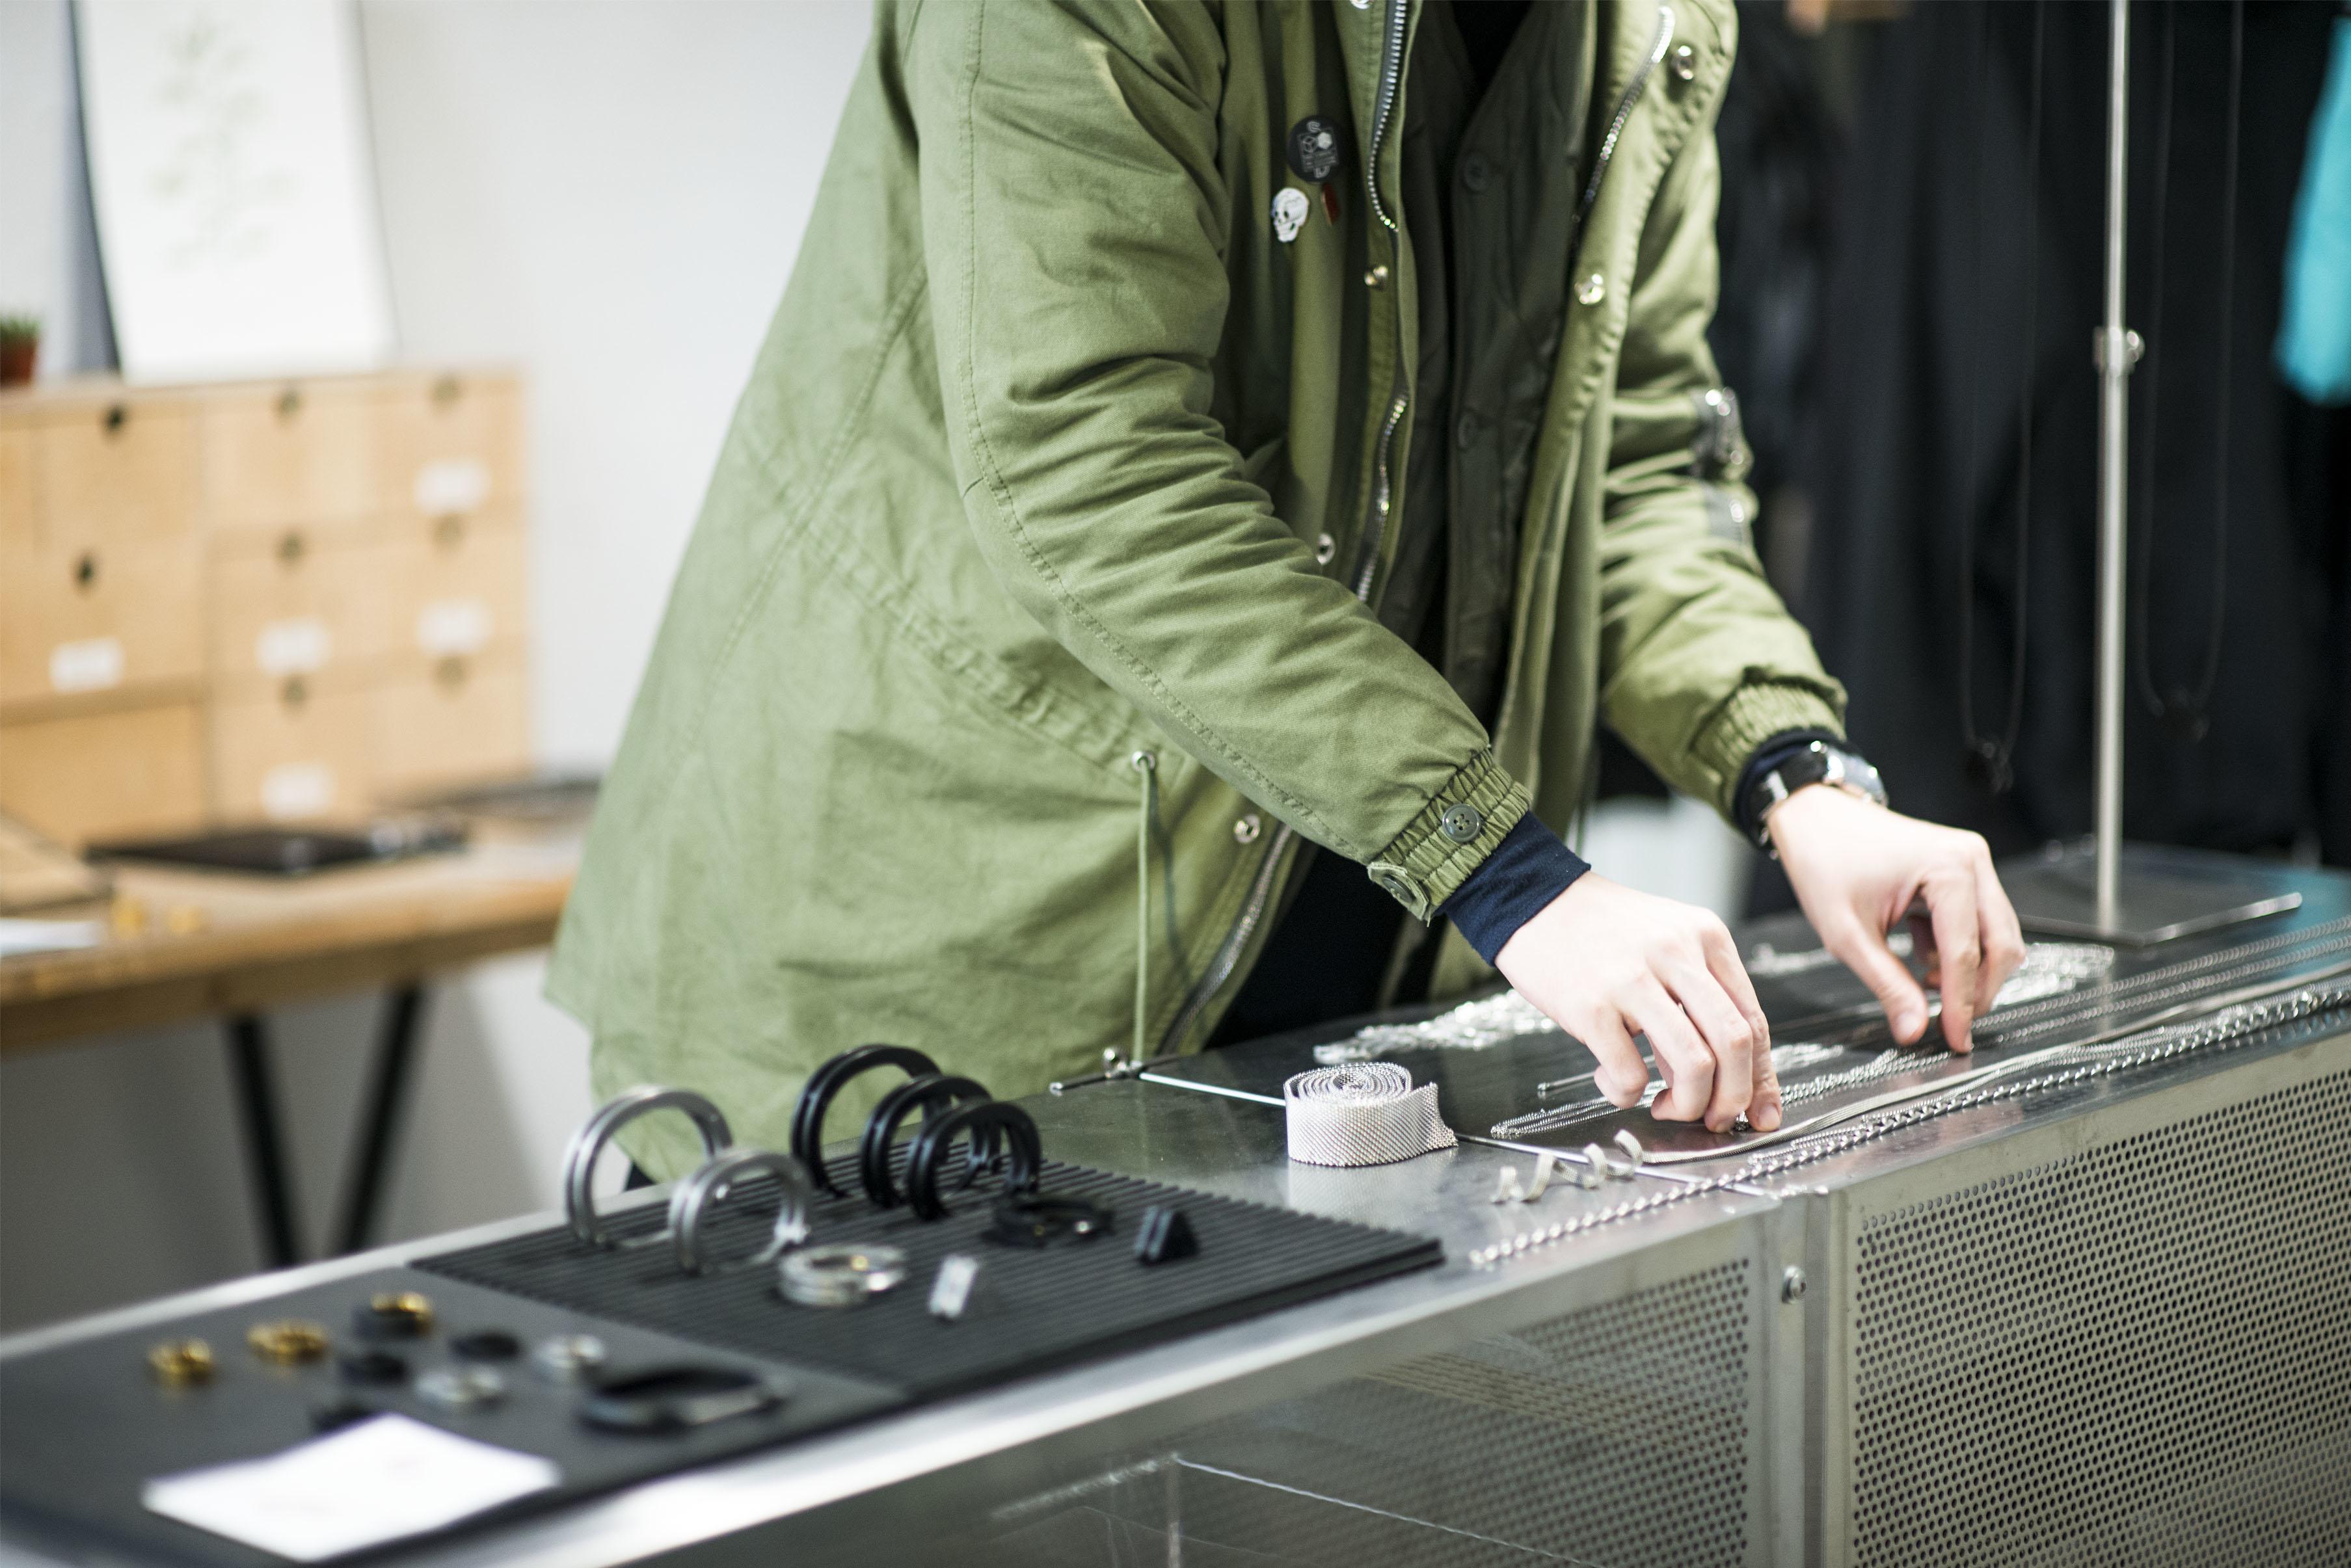 nozzle quiz 專訪 誠品生活松菸店,一個單身男子的房間快閃店主理人marco,正在把玩著飾品品牌drilling lab